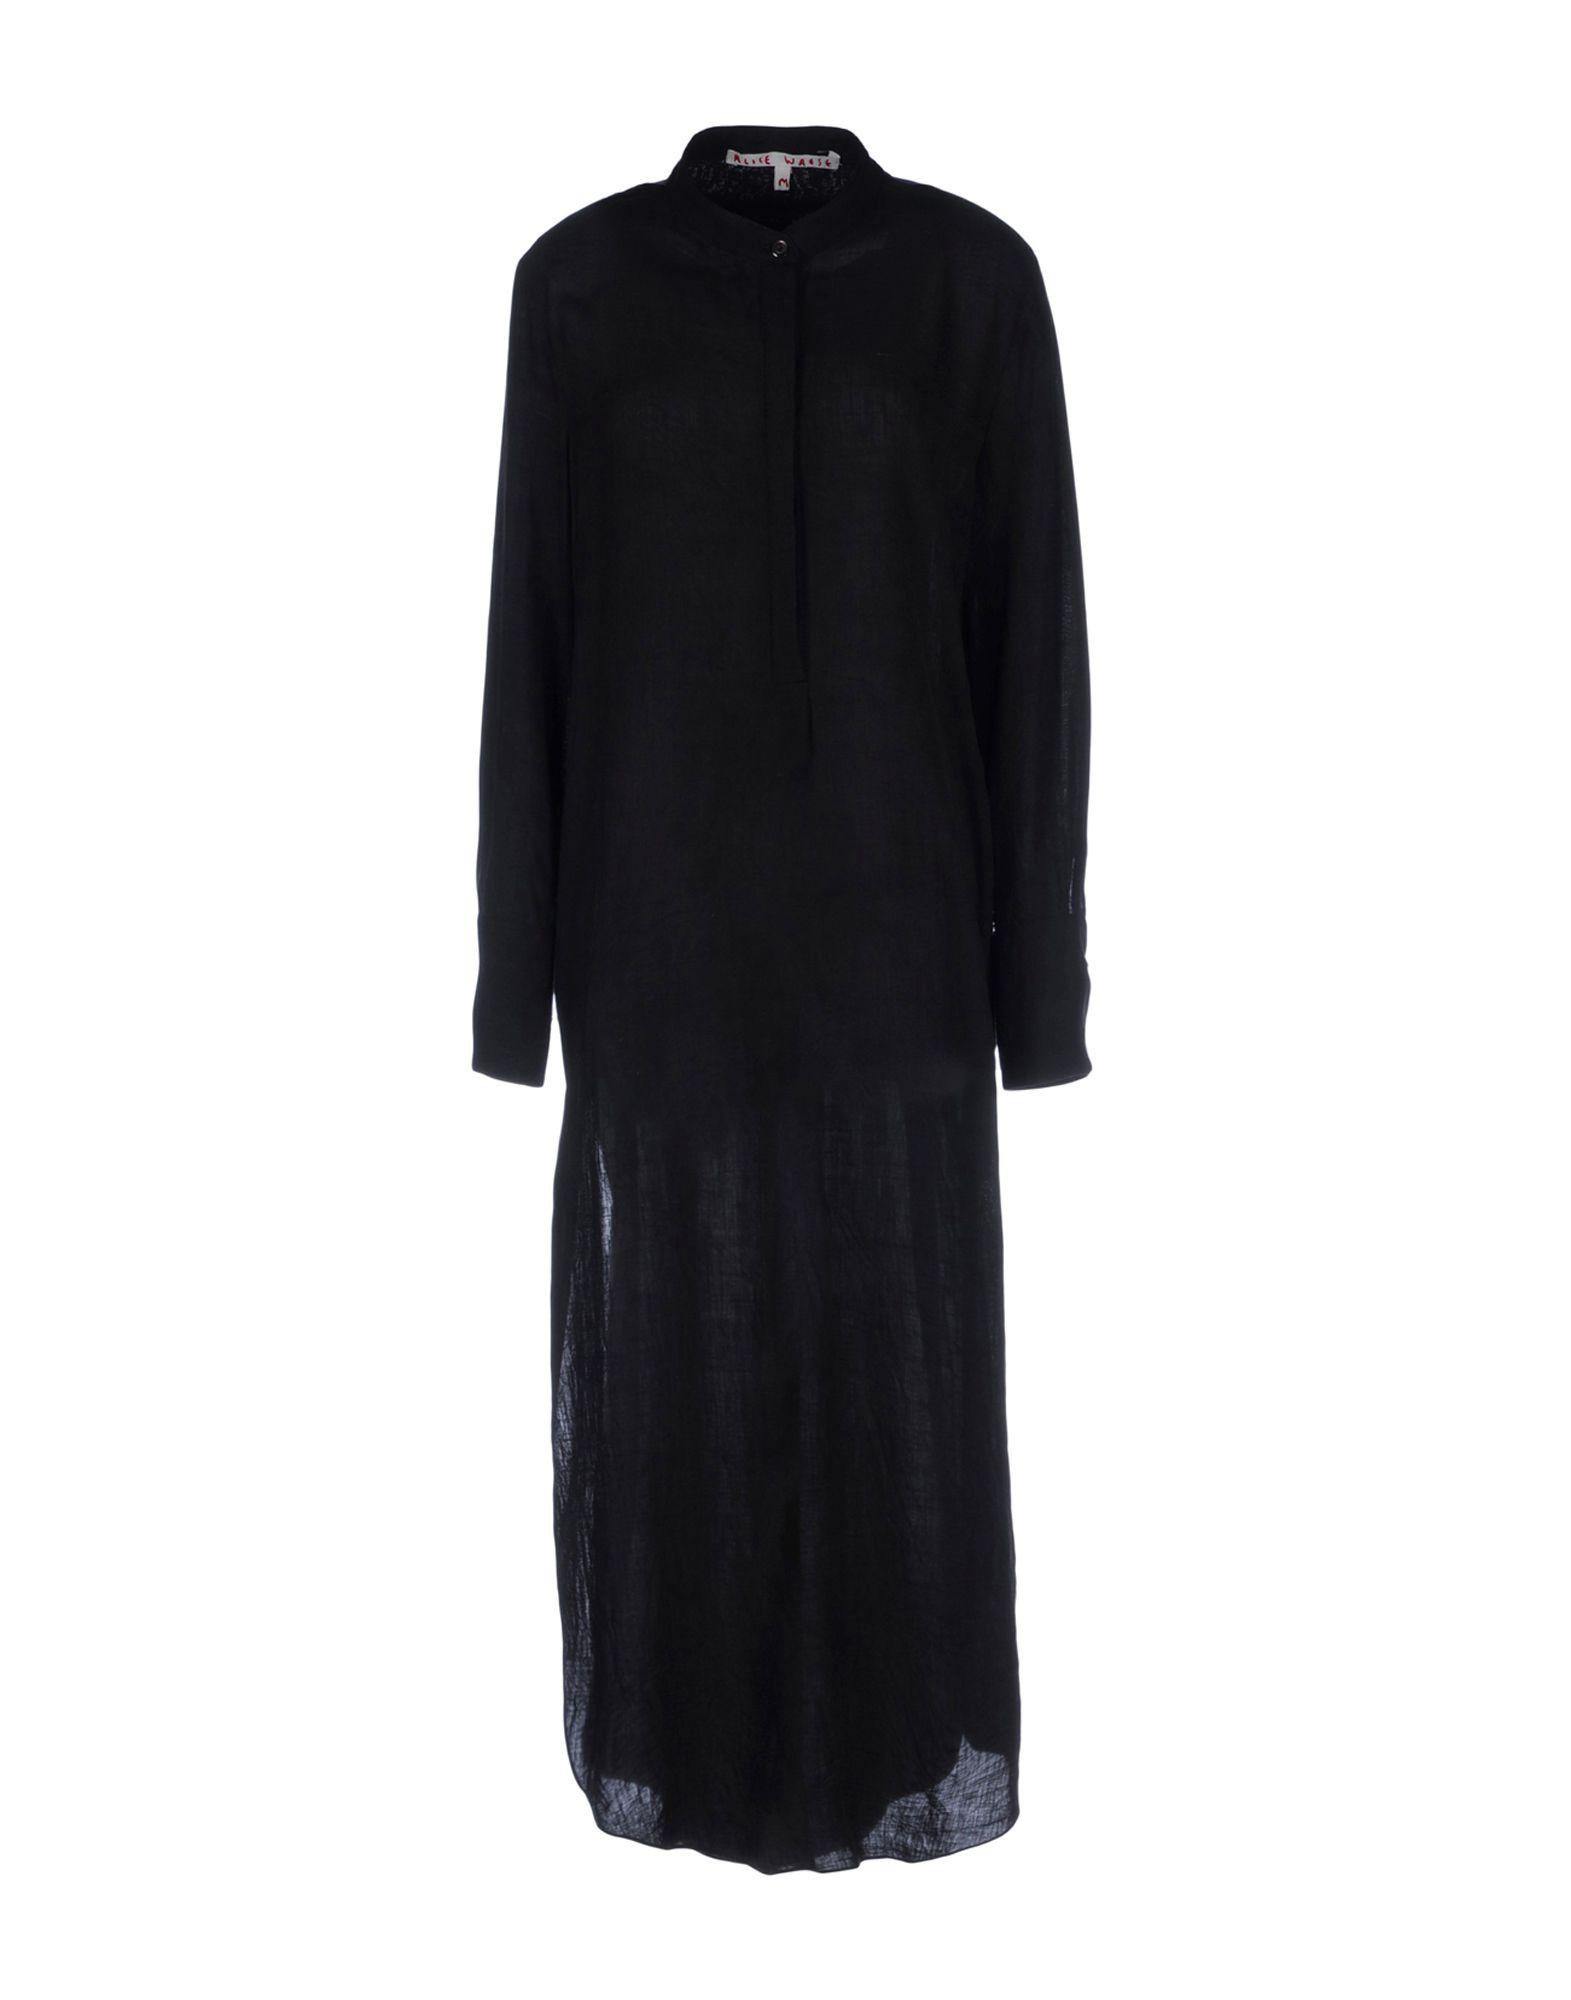 ALICE WAESE Платье длиной 3/4 lisa corti платье длиной 3 4